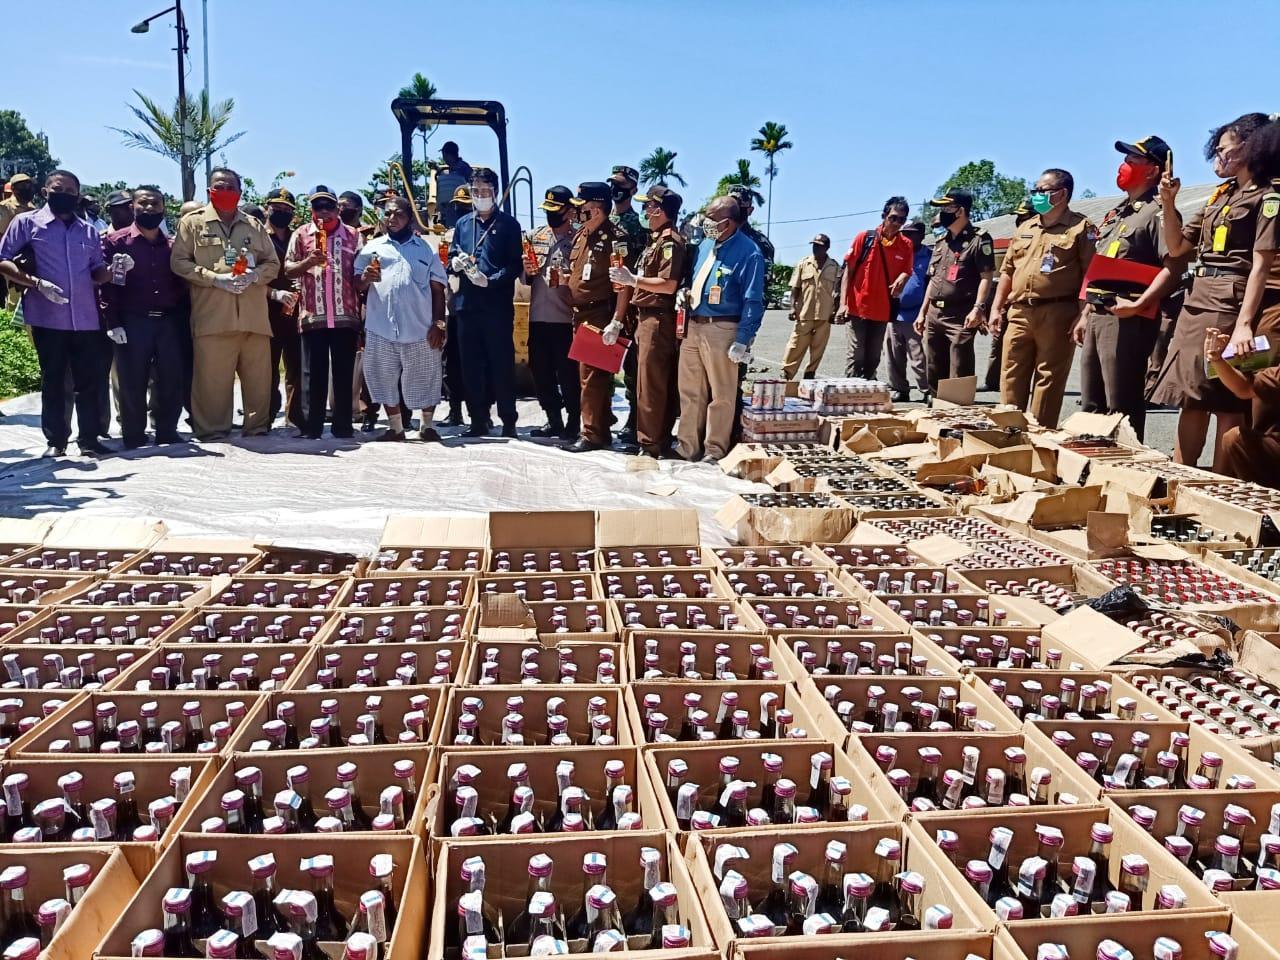 Kejati Papua Barat Musnahkan 4.041 Botol Miras Dan Belasan Bungkus Ganja 18 IMG 20200720 WA0038